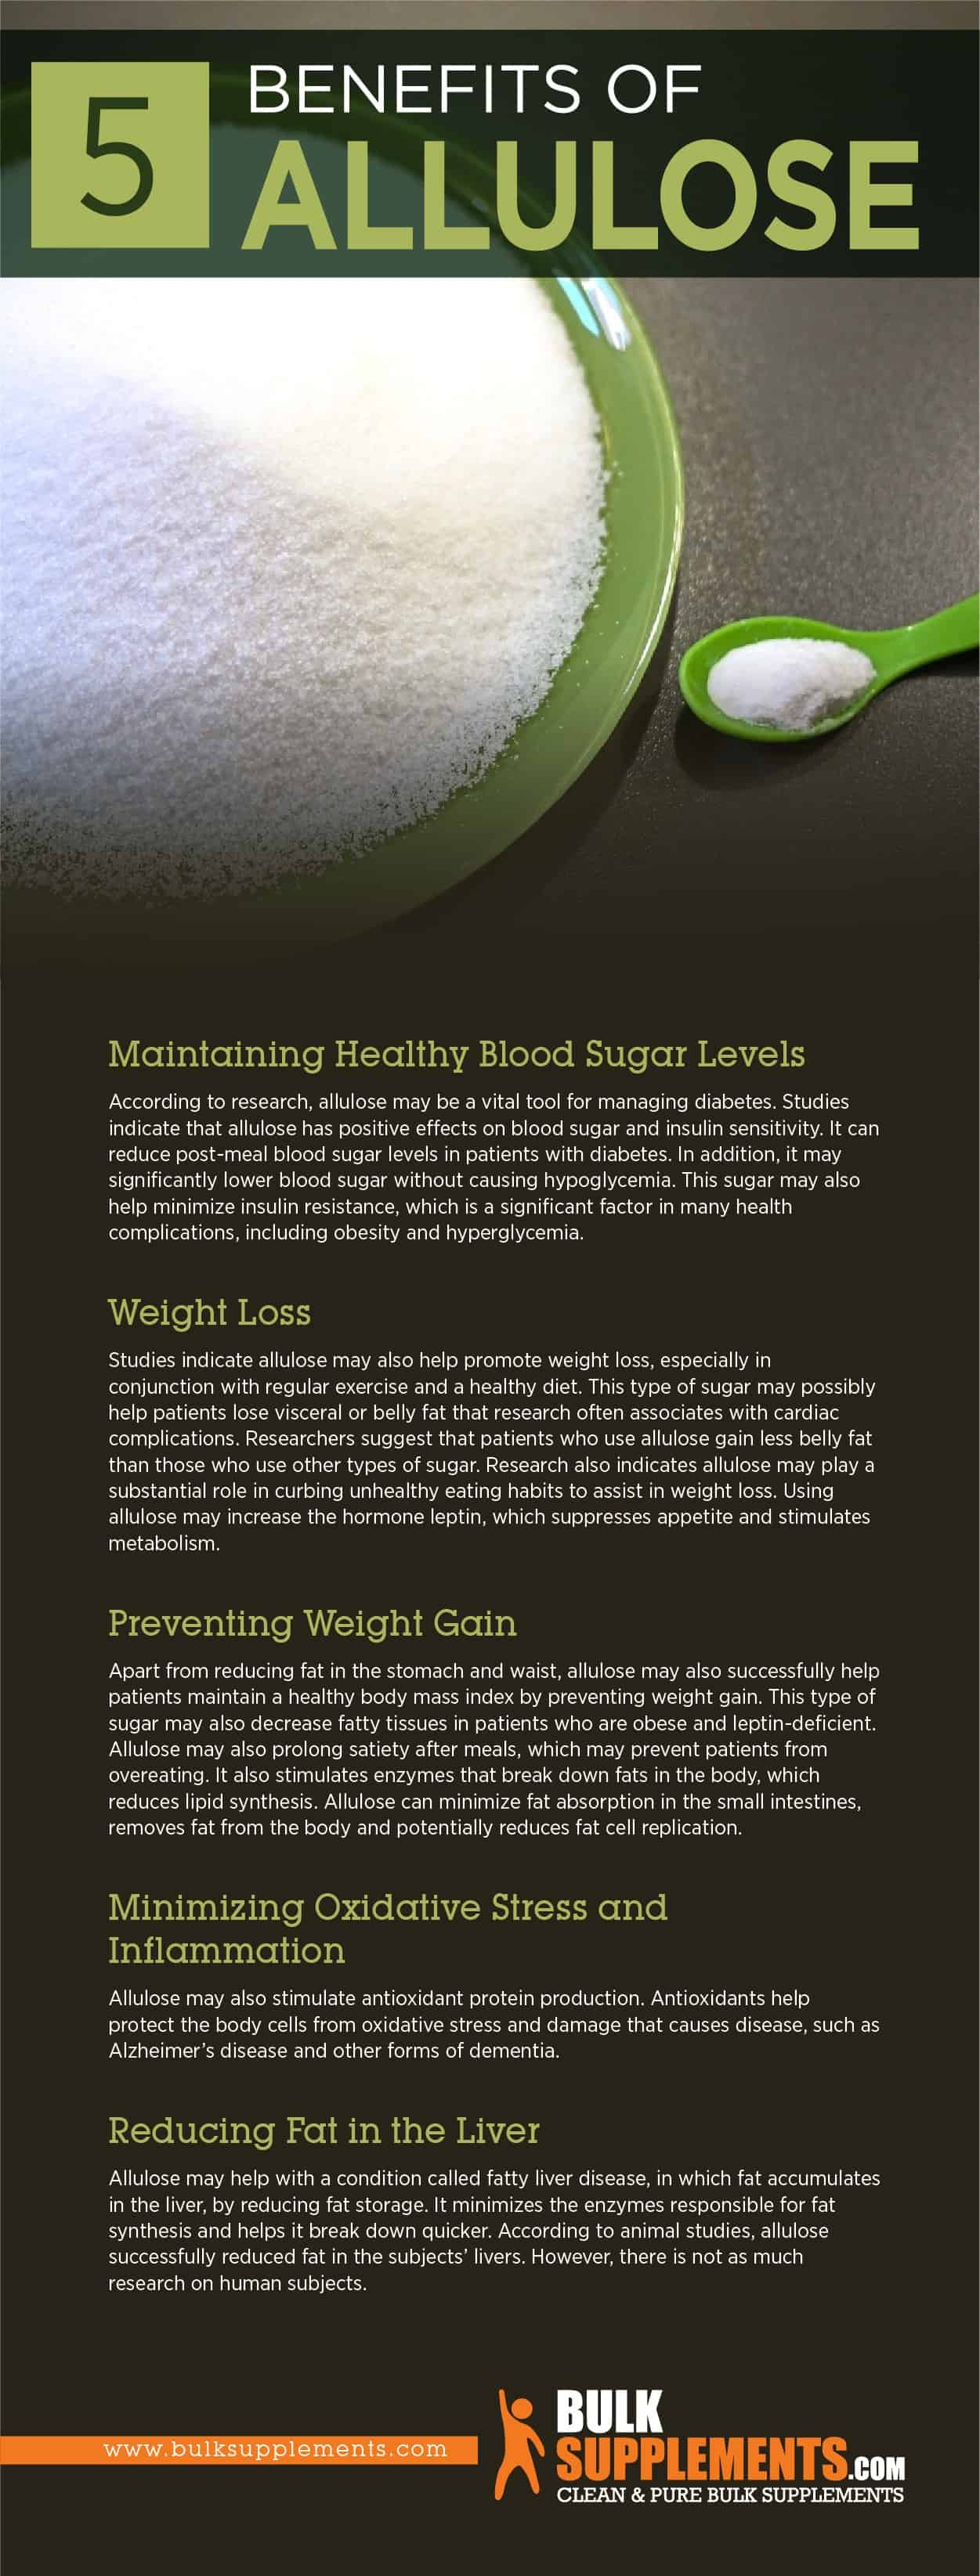 Benefits of Allulose